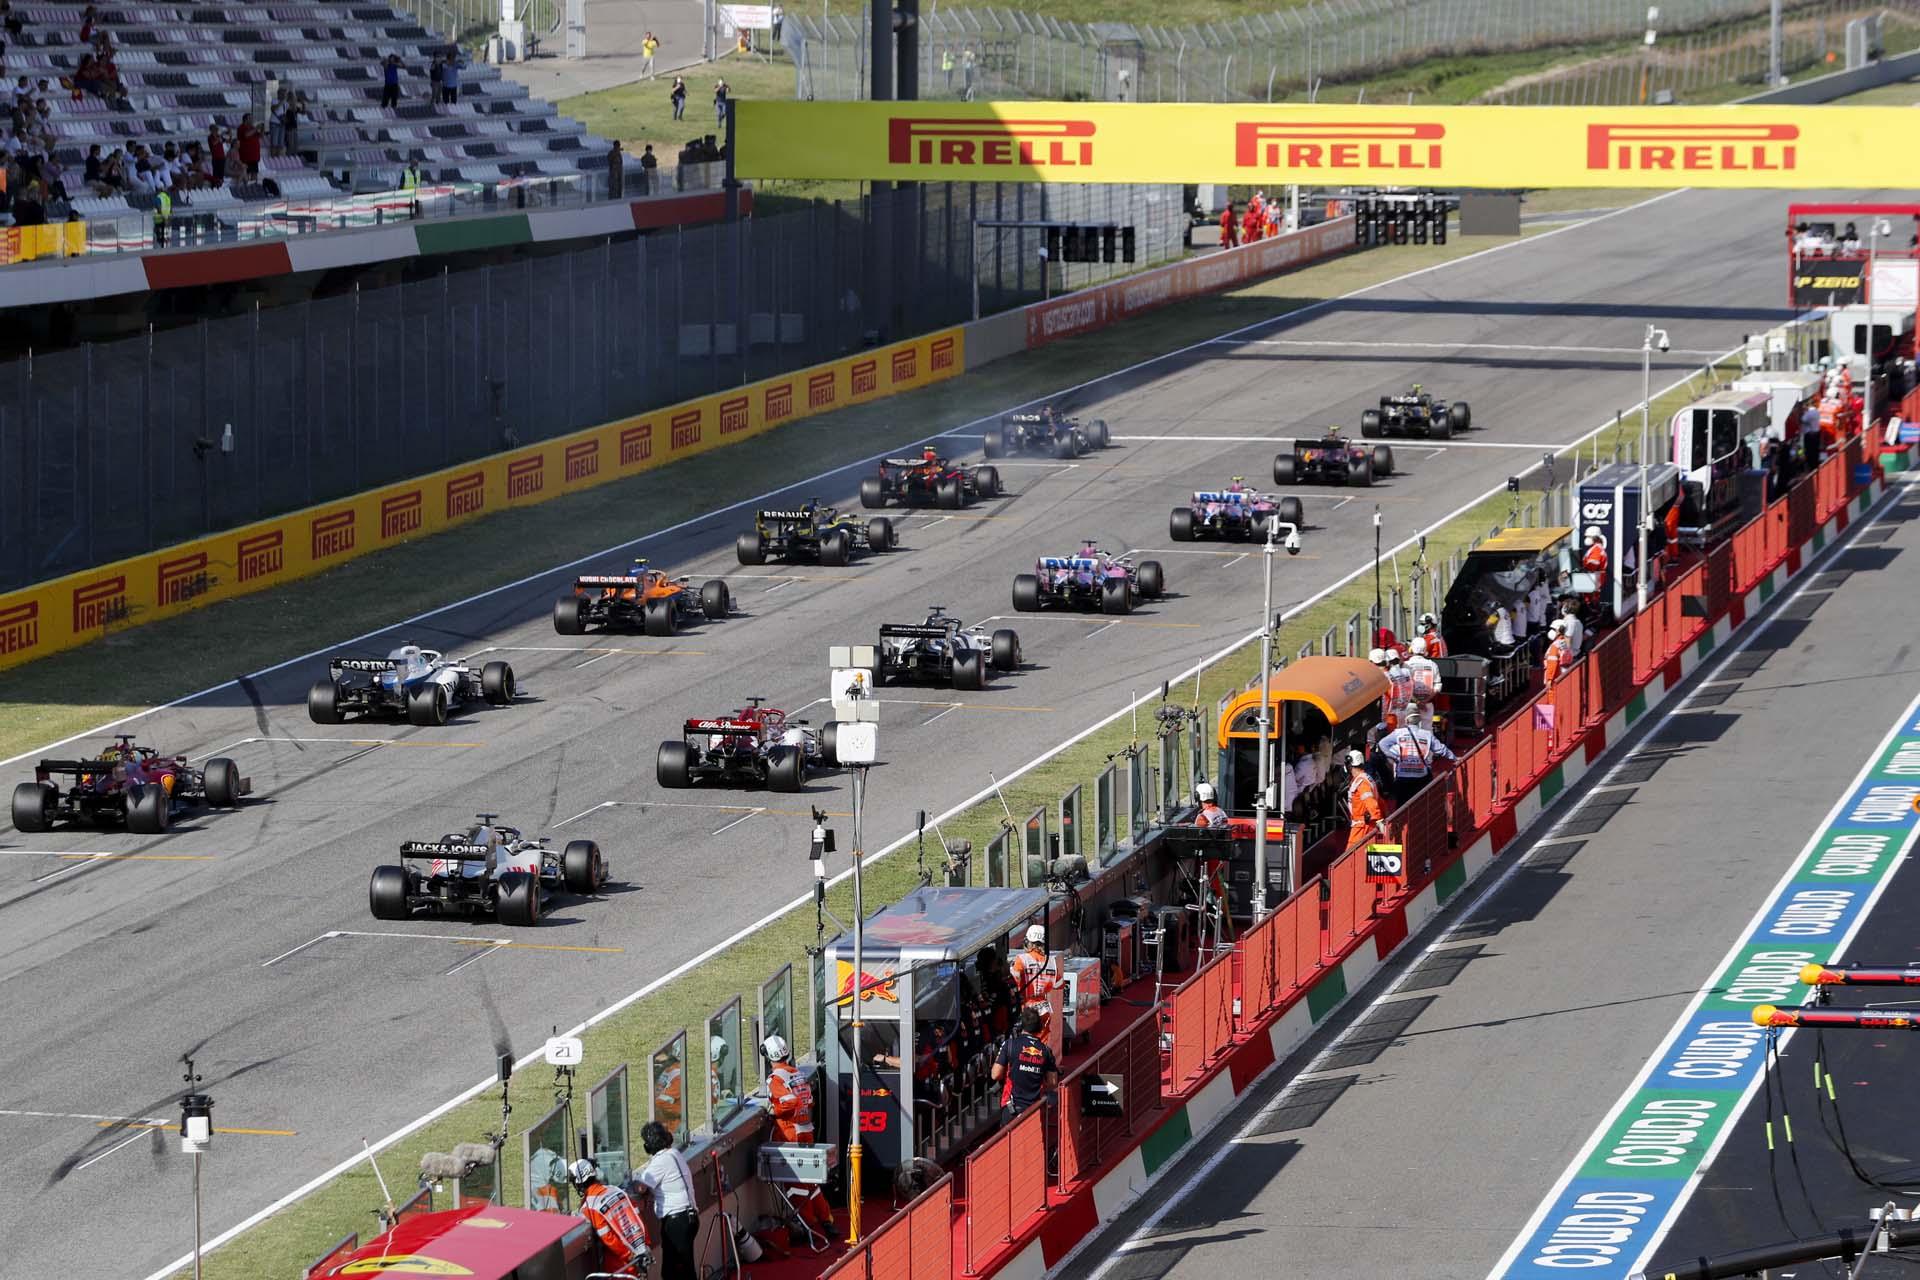 2020 Tuscany GP